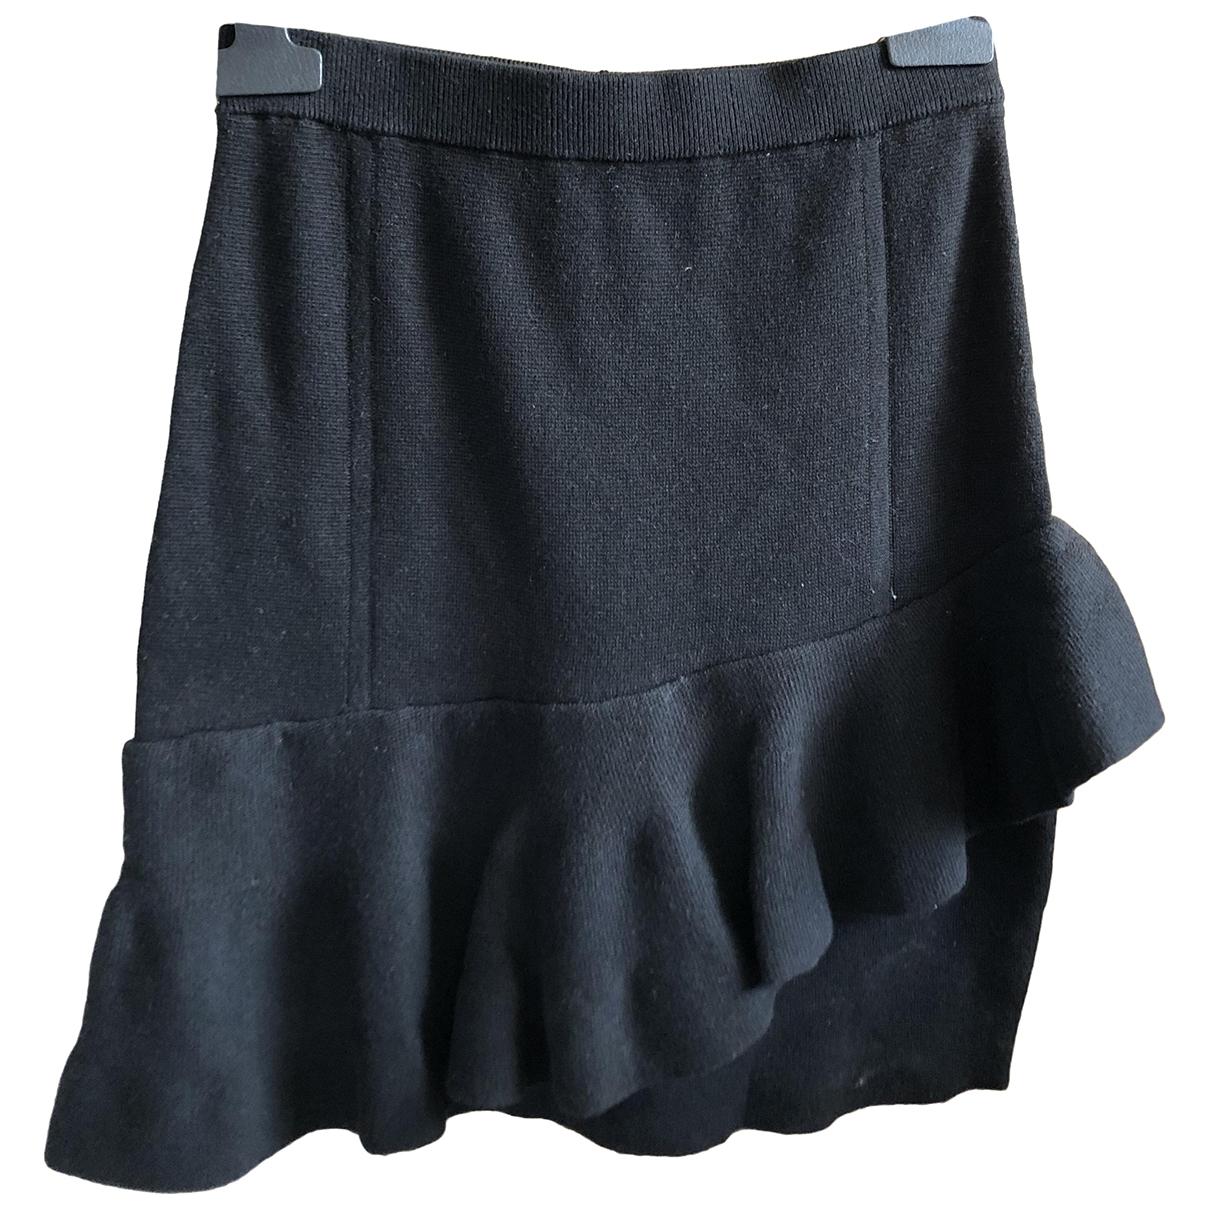 Sandro - Jupe   pour femme en coton - elasthane - noir